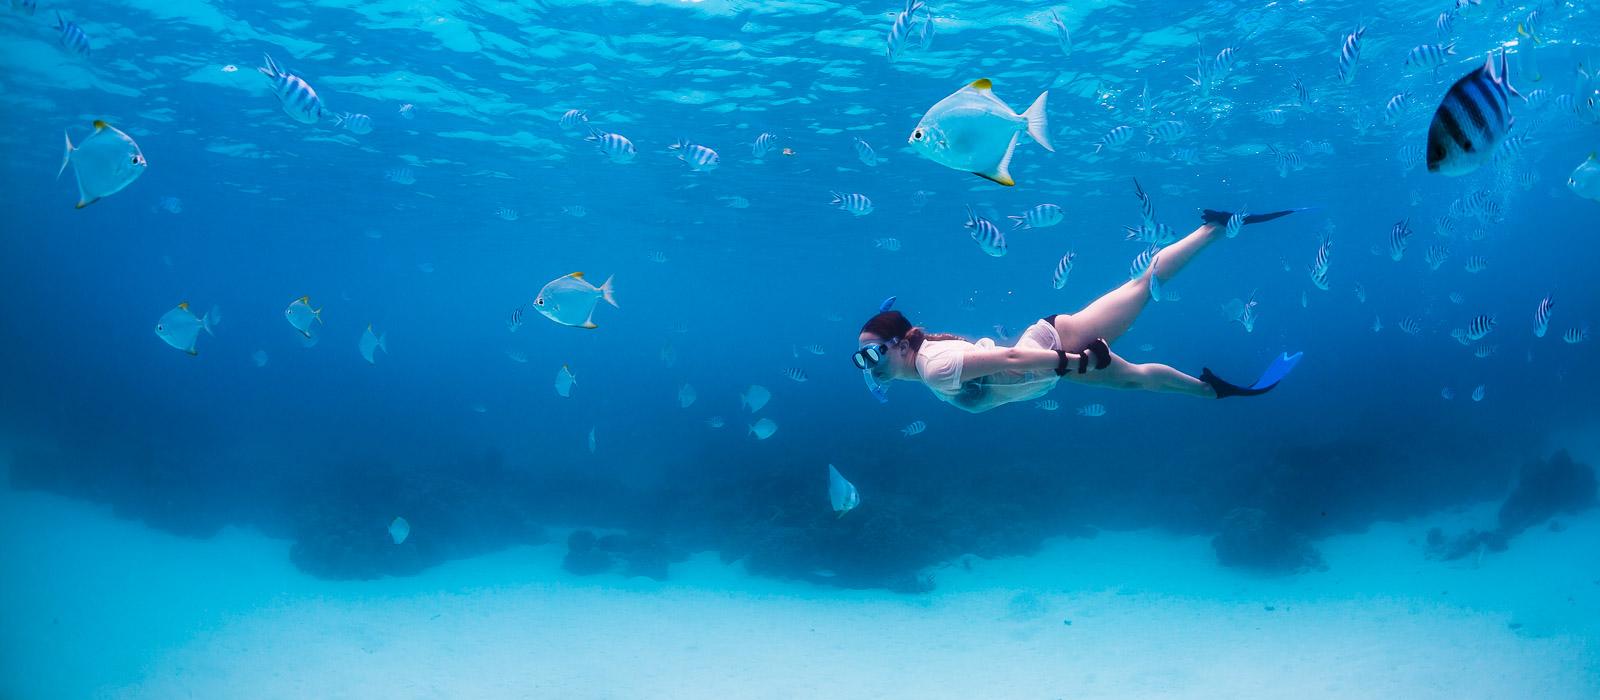 underwater photographer, undervattensfotograf, snorkeling, diving, seychelles, seychellerna, fish, fisk